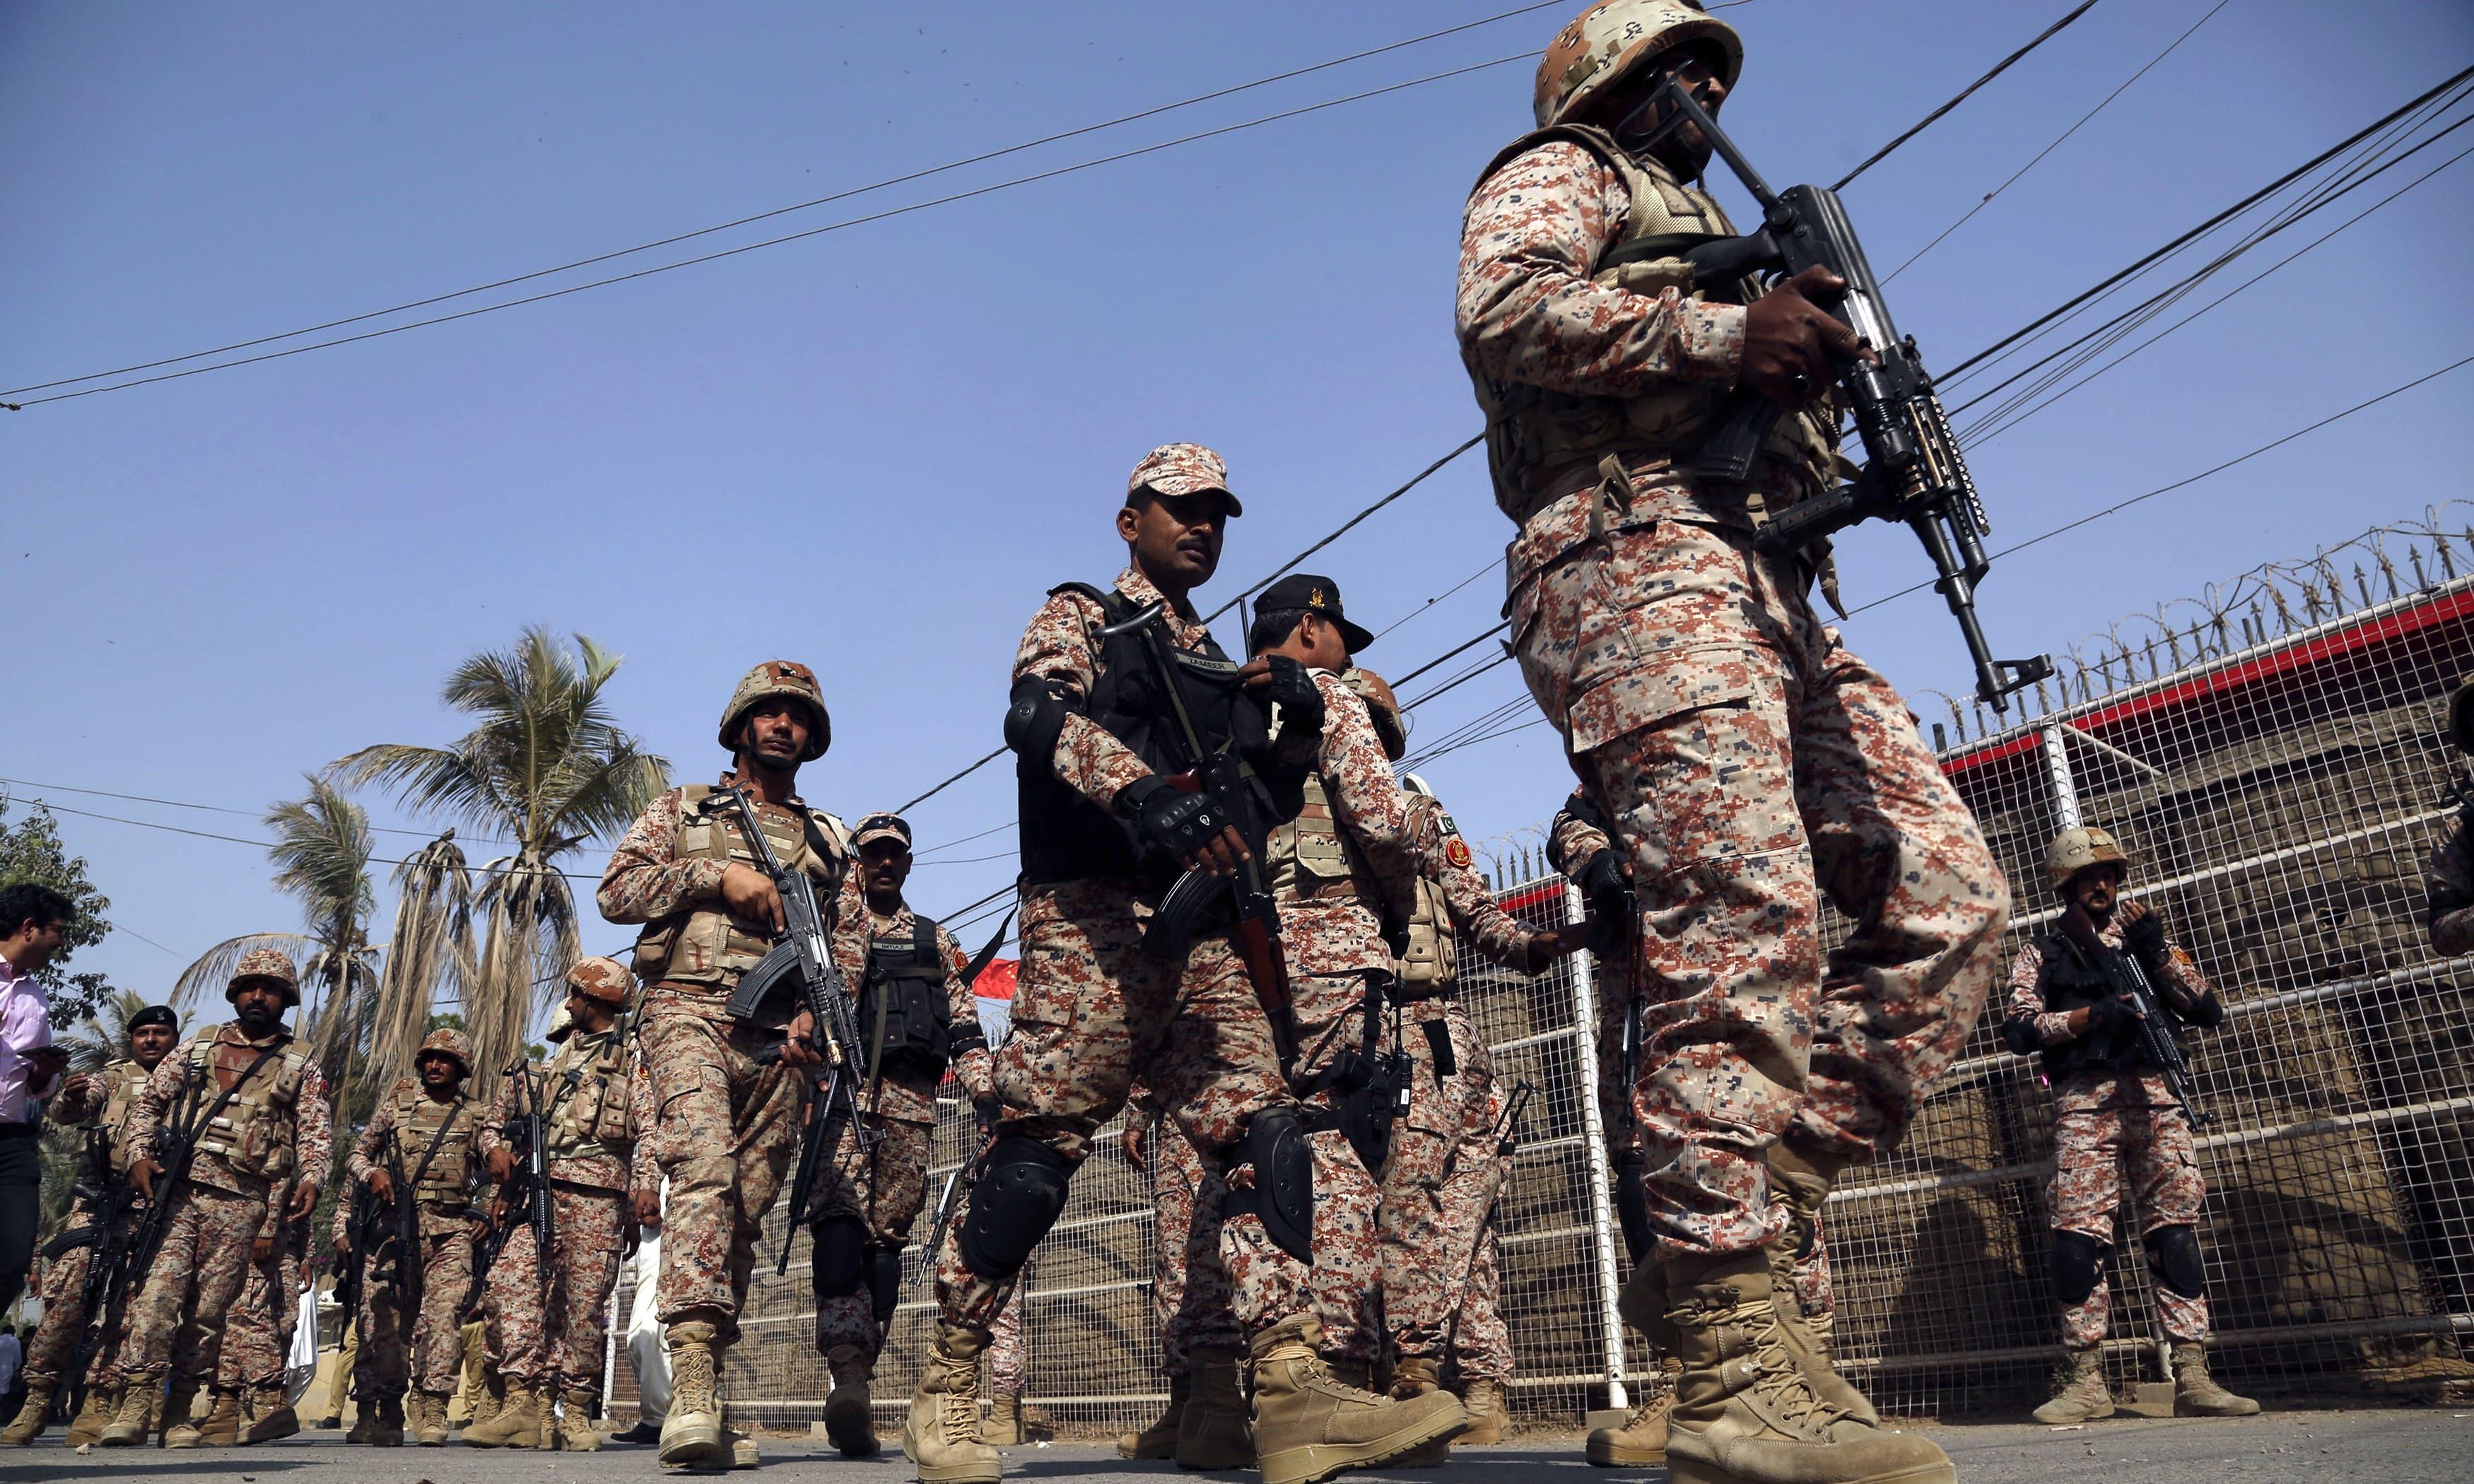 Friday's Karachi, Orakzai attacks bloodily underline that Pakistan is still facing complex militant threats